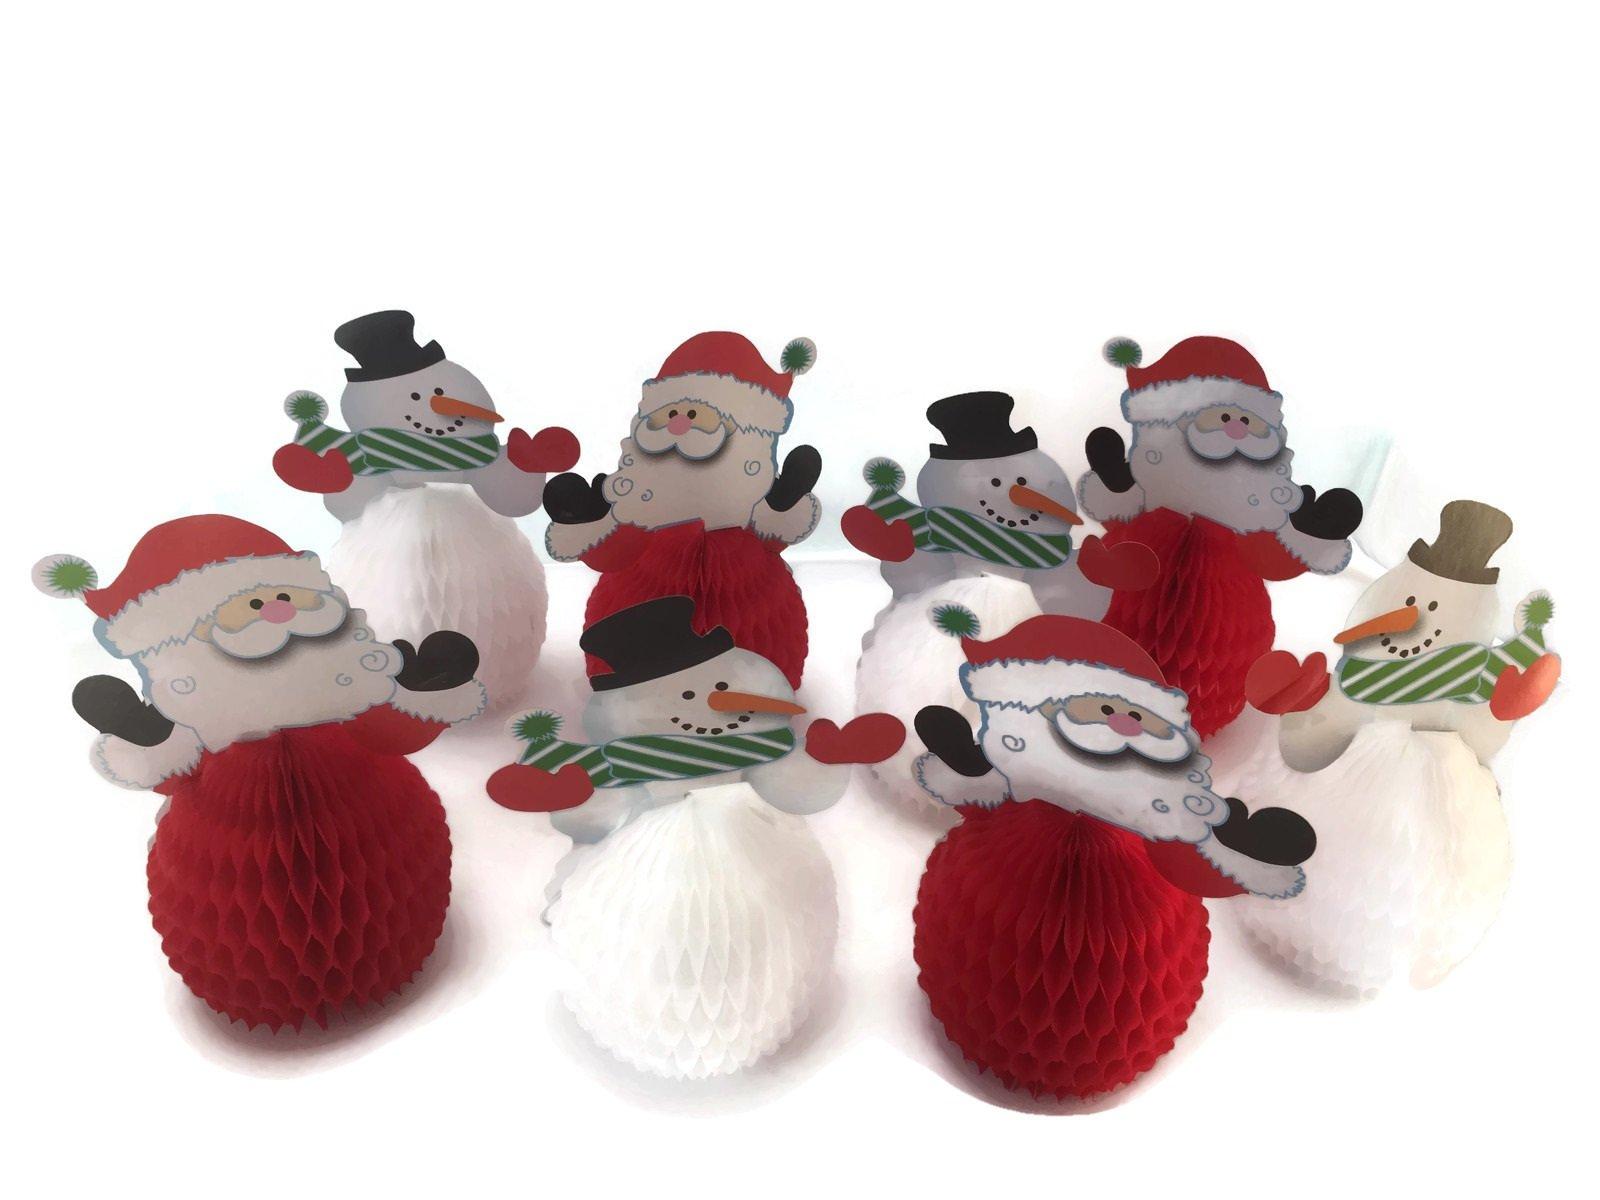 6'' Mini Santa Christmas Centerpiece Decorations and 6'' Mini Snowman Holiday Centerpiece Decorations - 8 Count Total (Santa and Snowmen)